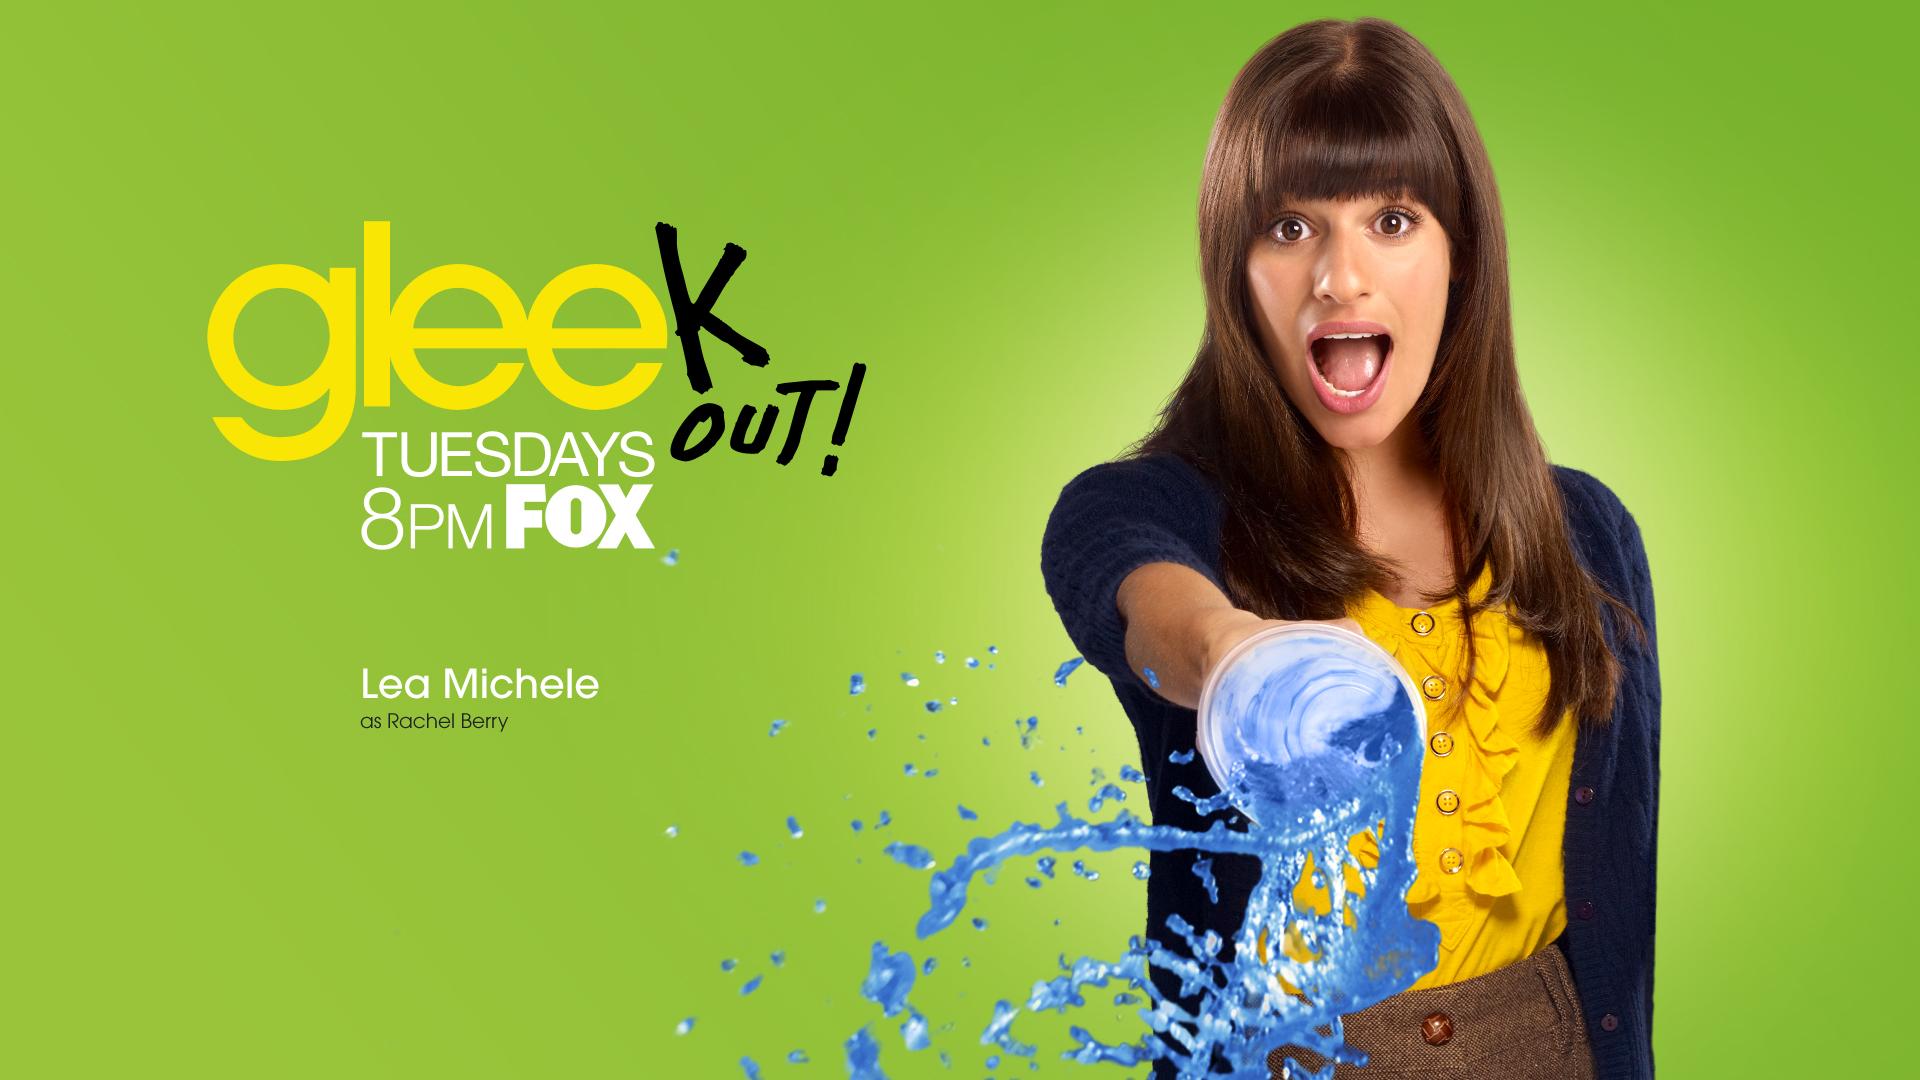 Glee Wallpaper Lea Michele 1920x1080jpg 1920x1080